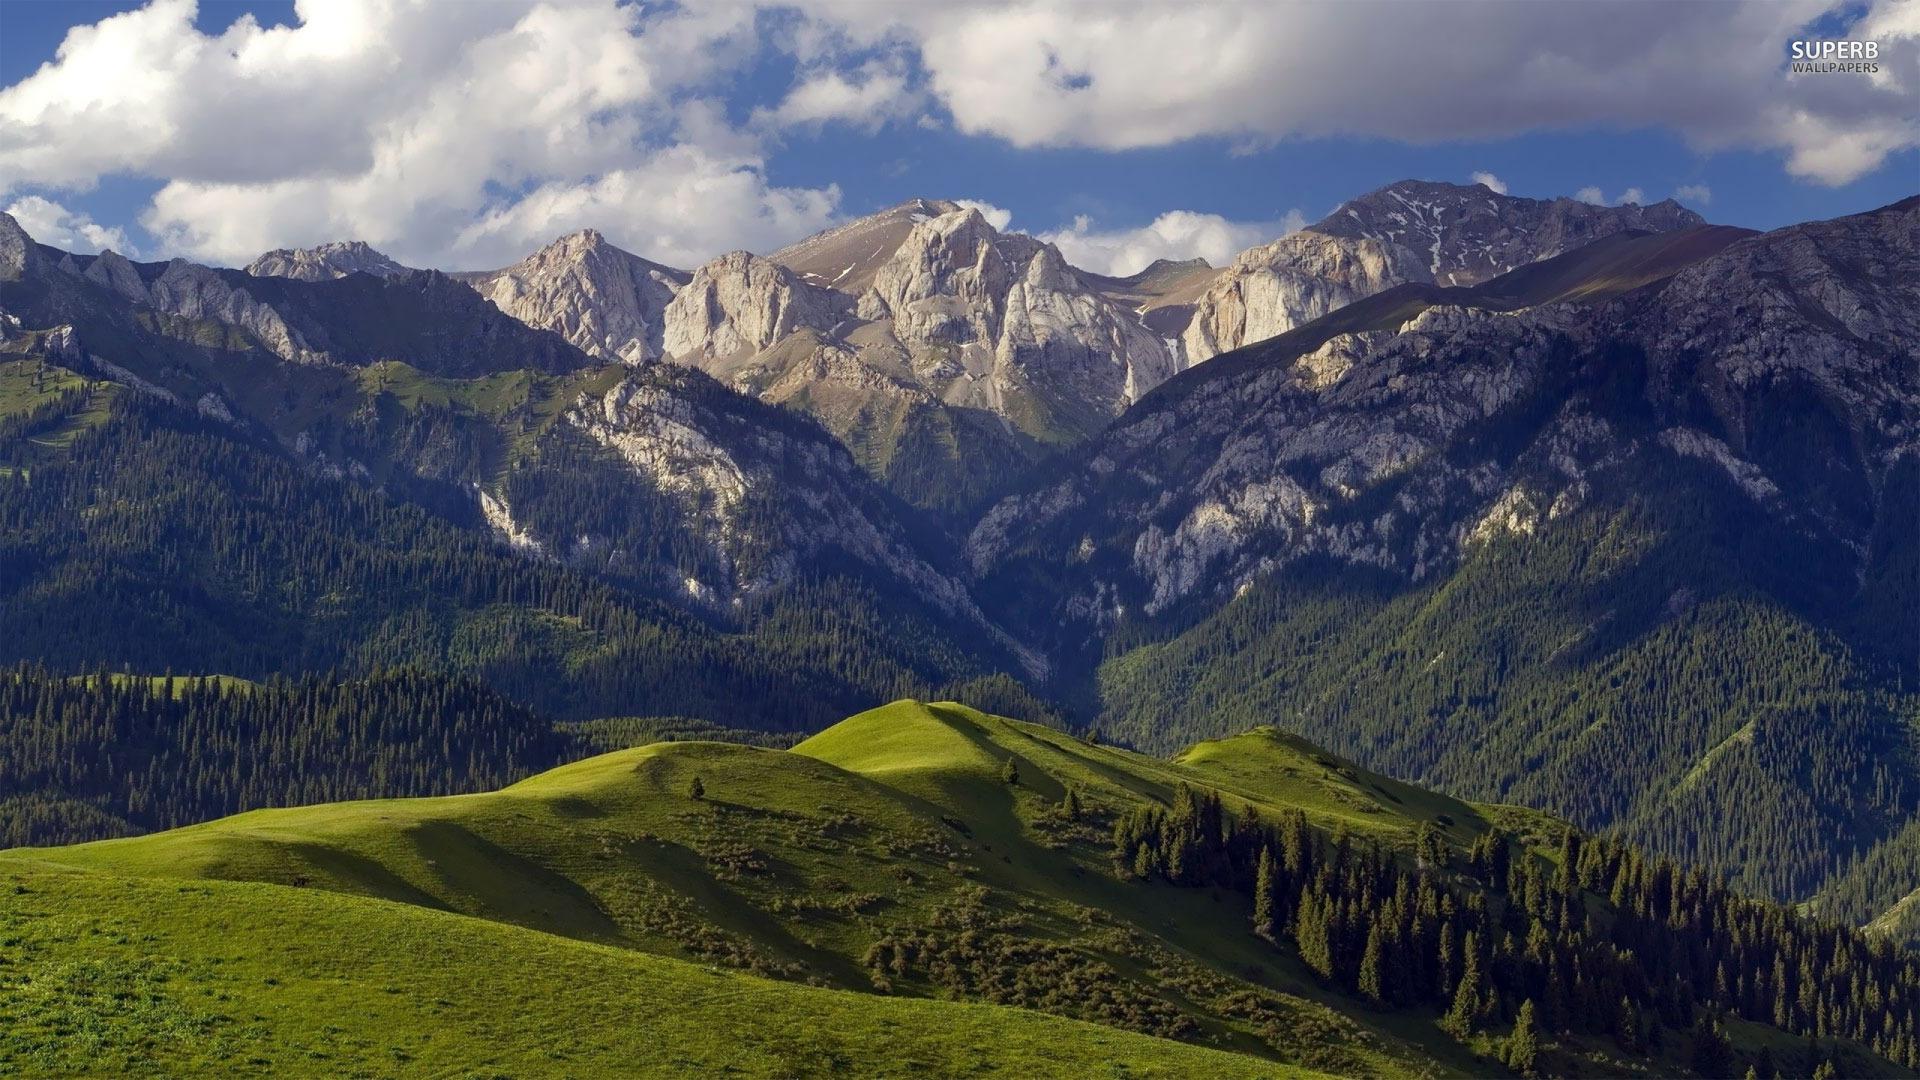 Download Mountains Wallpaper 1920x1080 5750 1920x1080 73